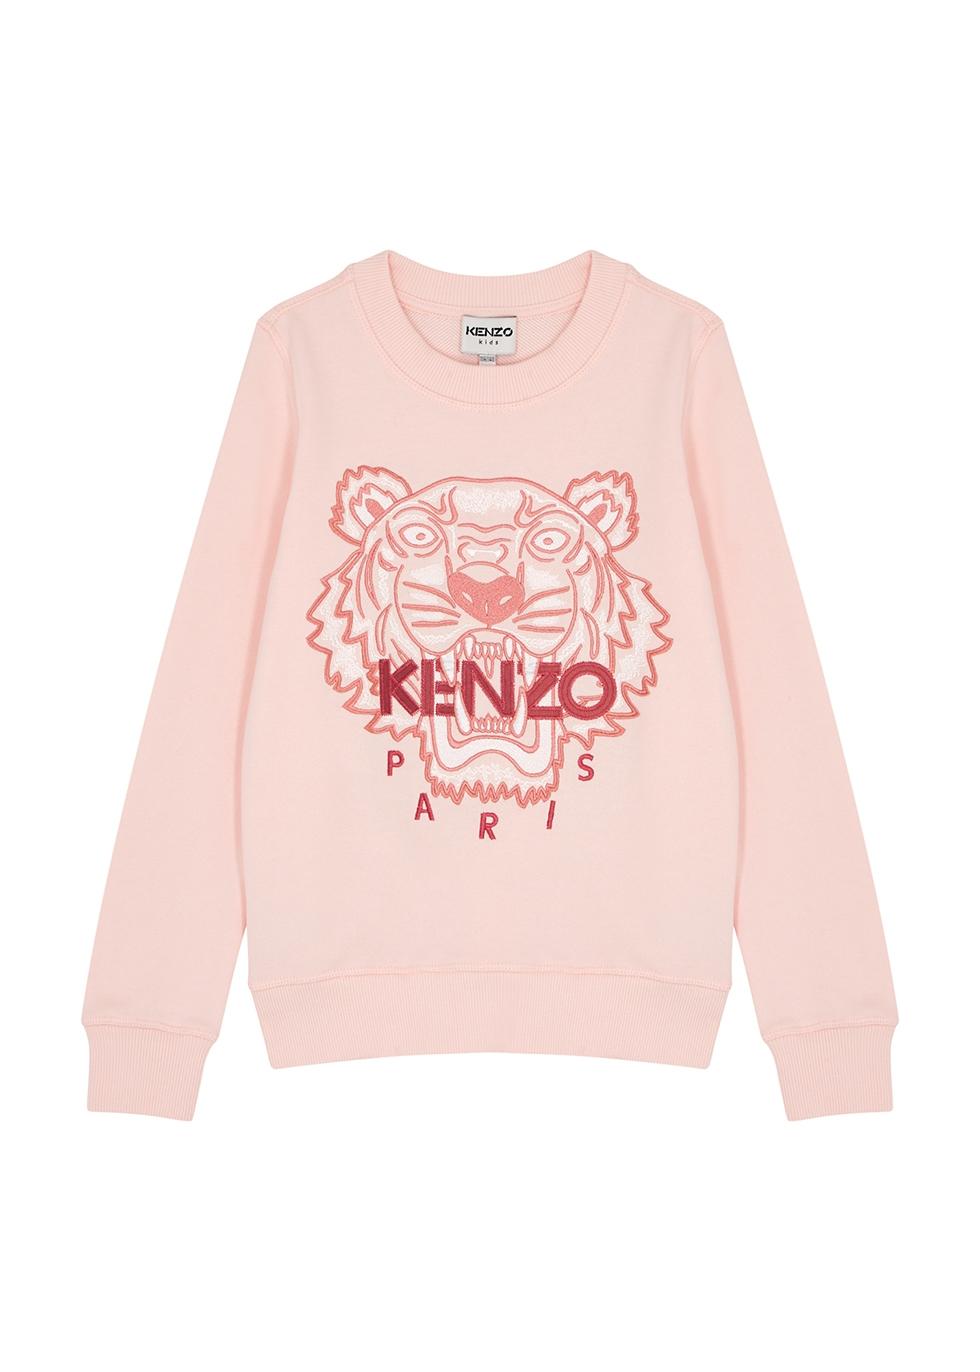 Pink logo-embroidered cotton sweatshirt (6-12 years)